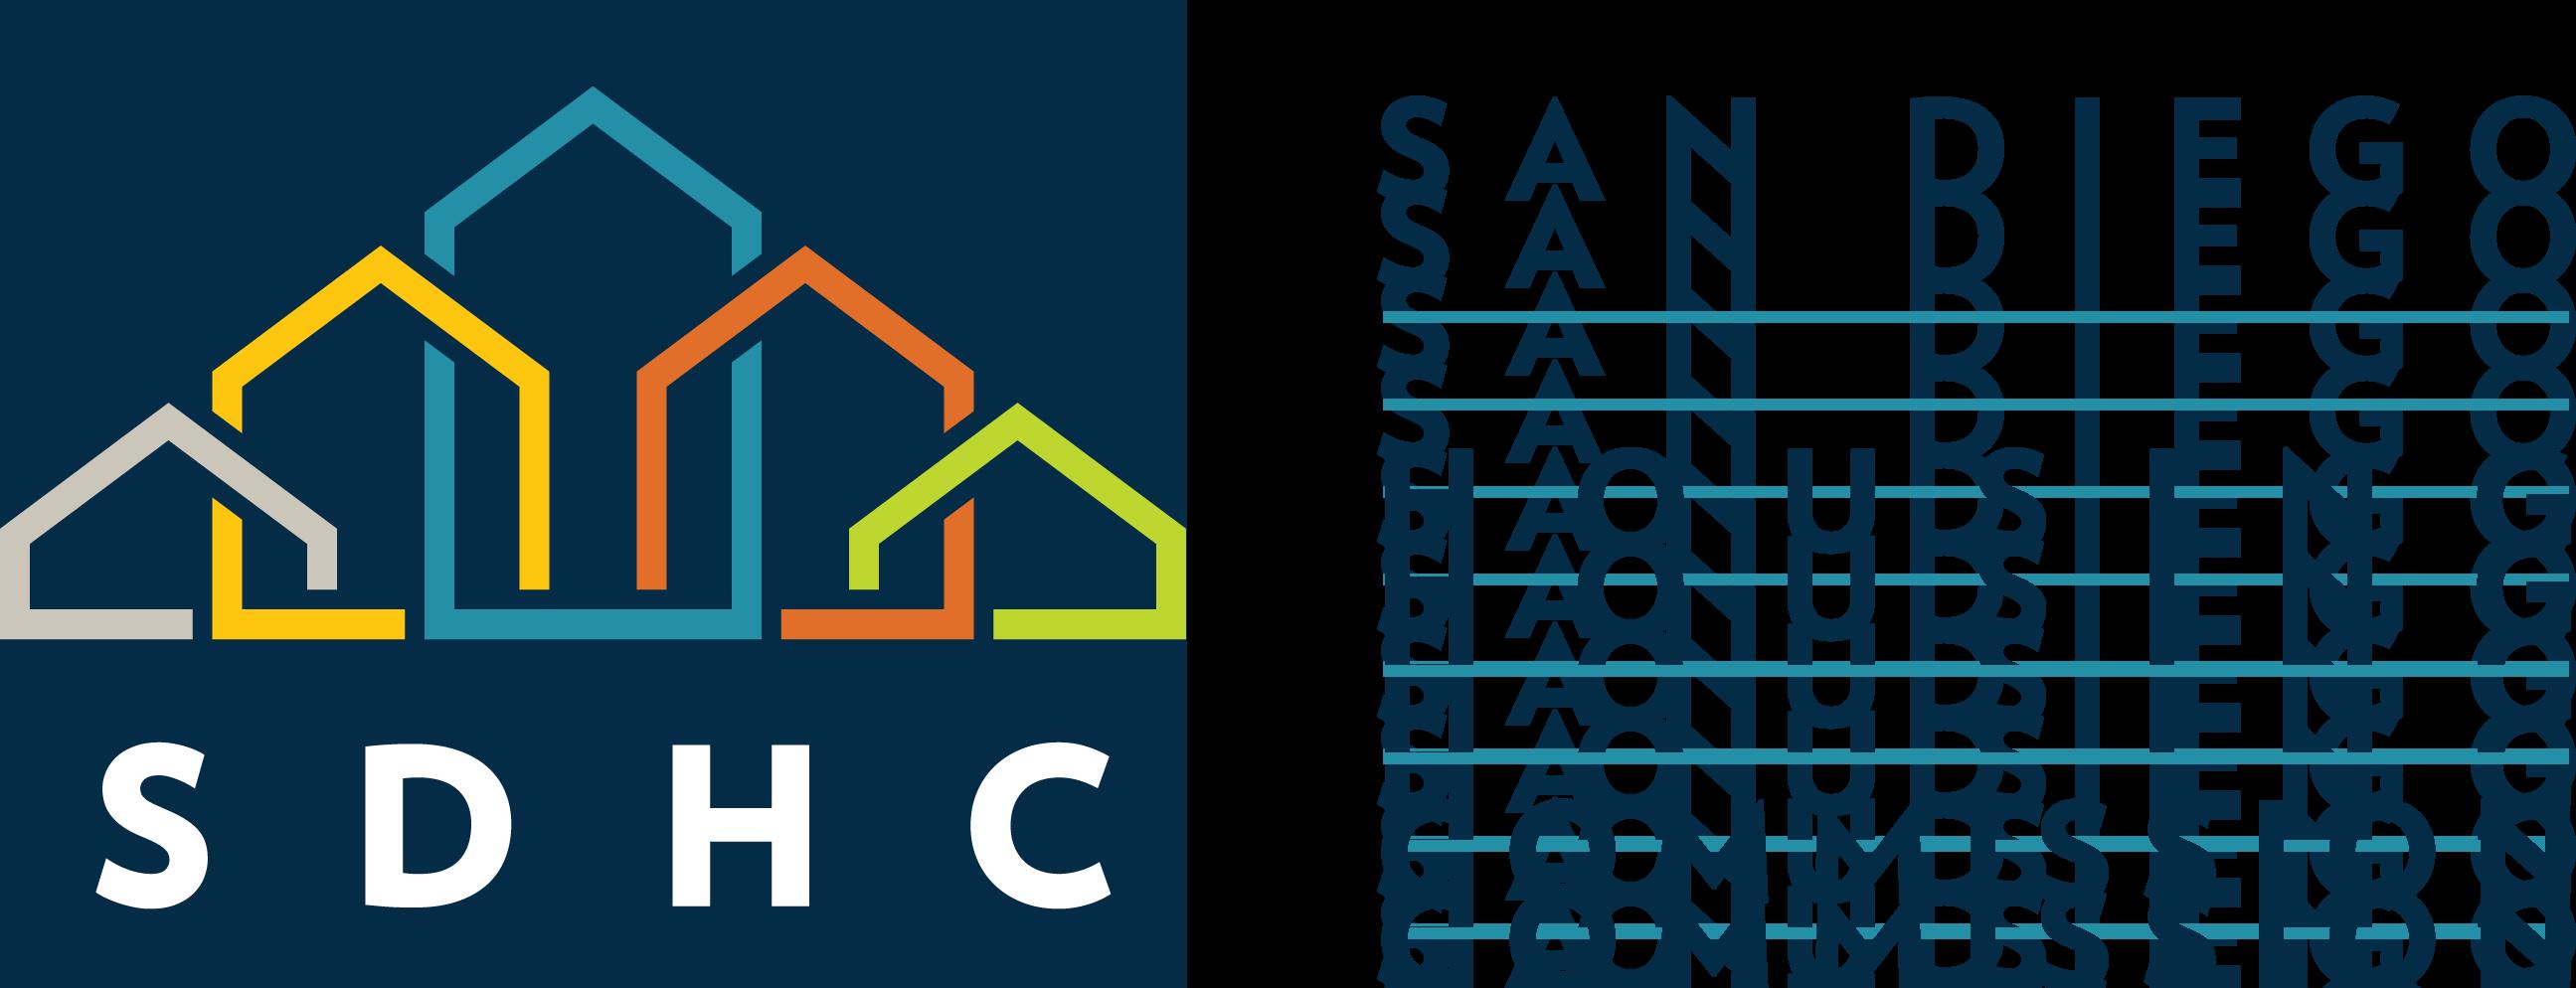 Family Reunification Program | Downtown San Diego Partnership